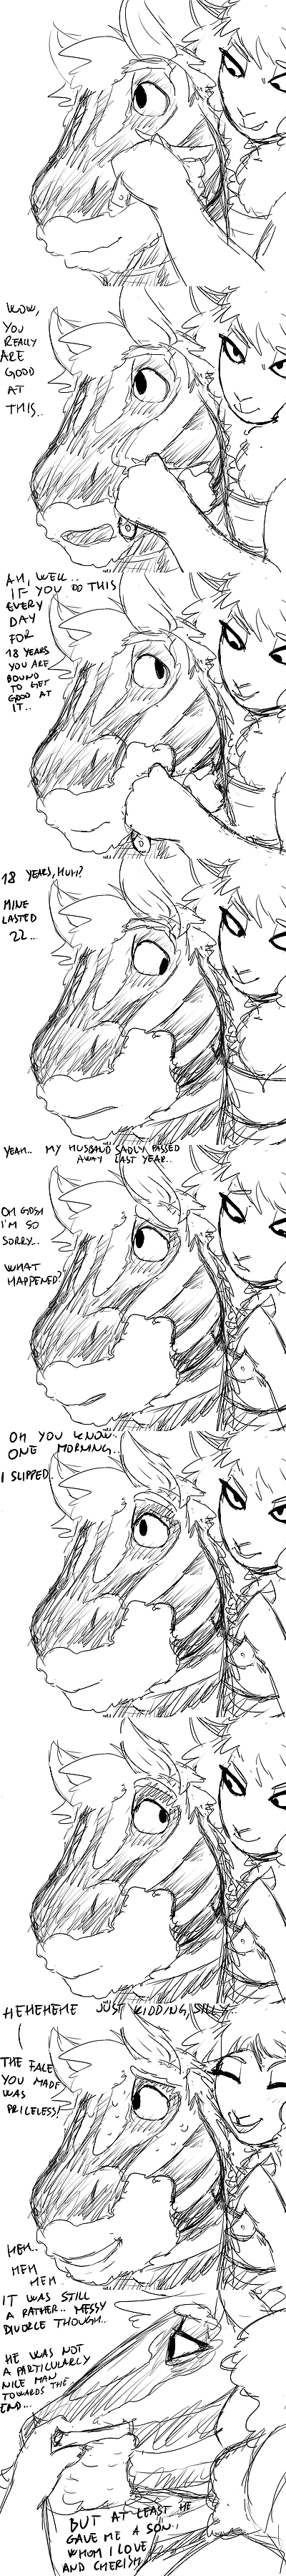 Zebra Dad and Boss Lamb